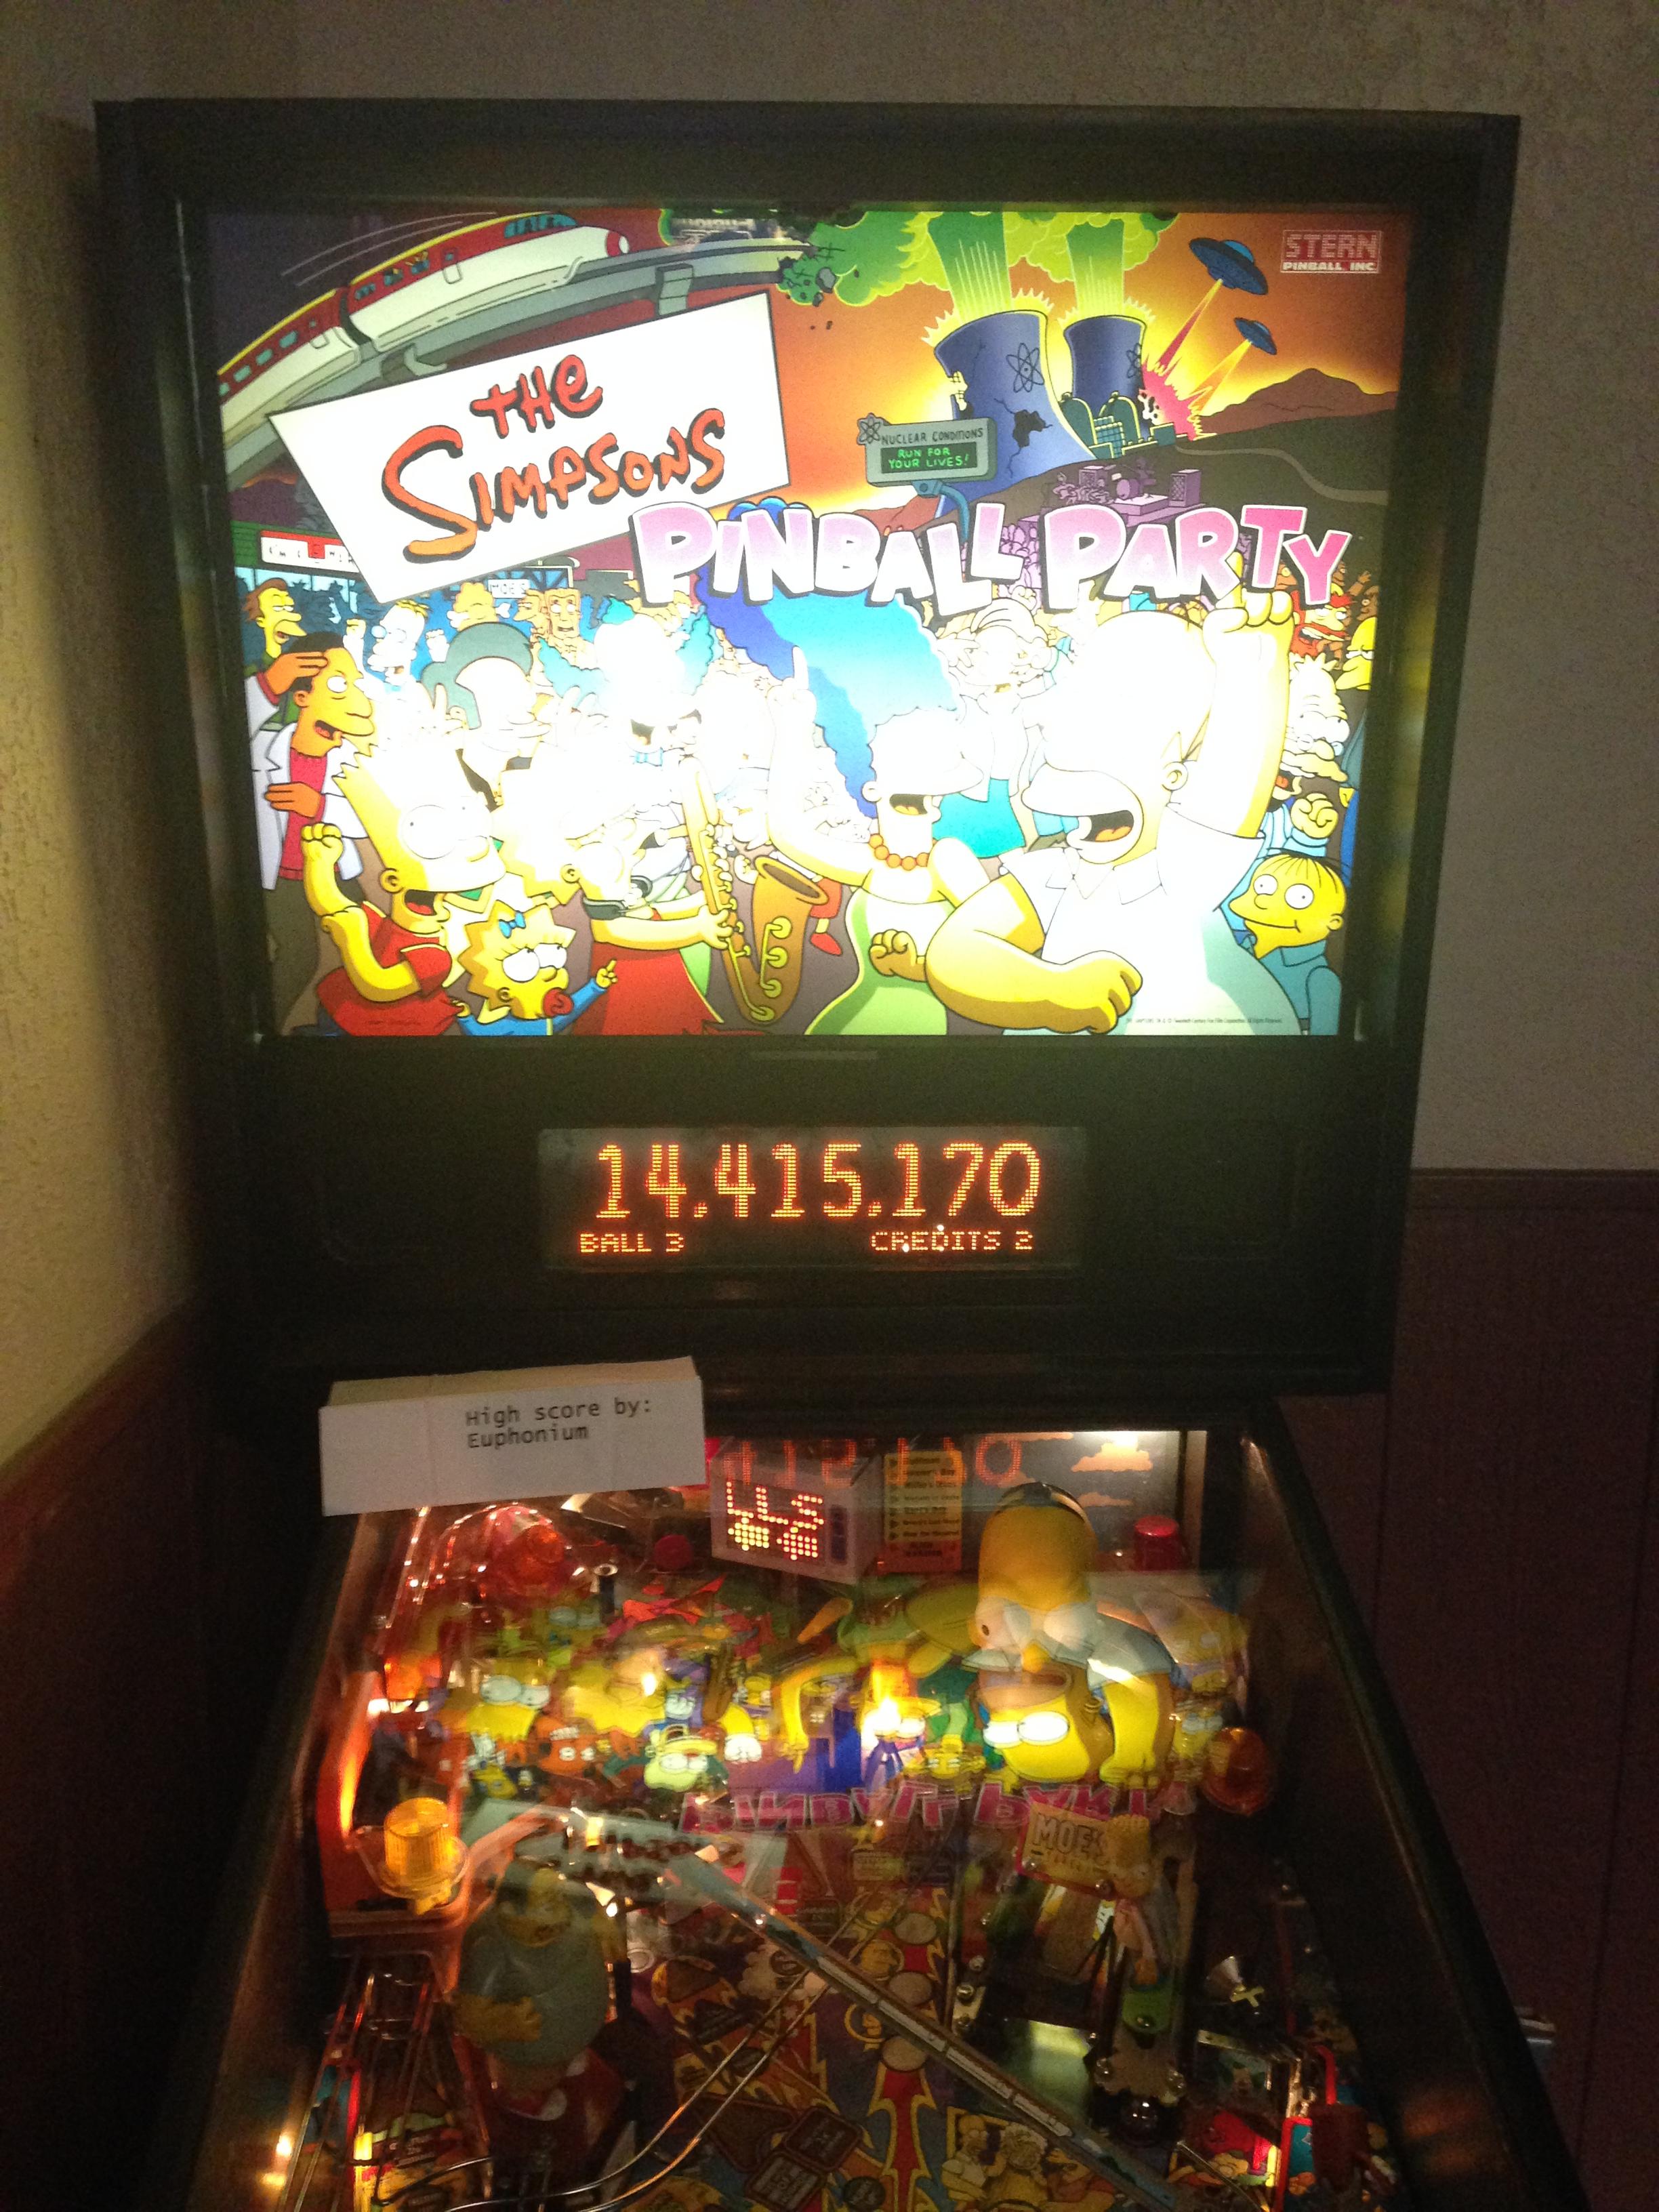 euphonium: The Simpsons Pinball Party (Pinball: 3 Balls) 14,415,170 points on 2016-09-22 17:35:28